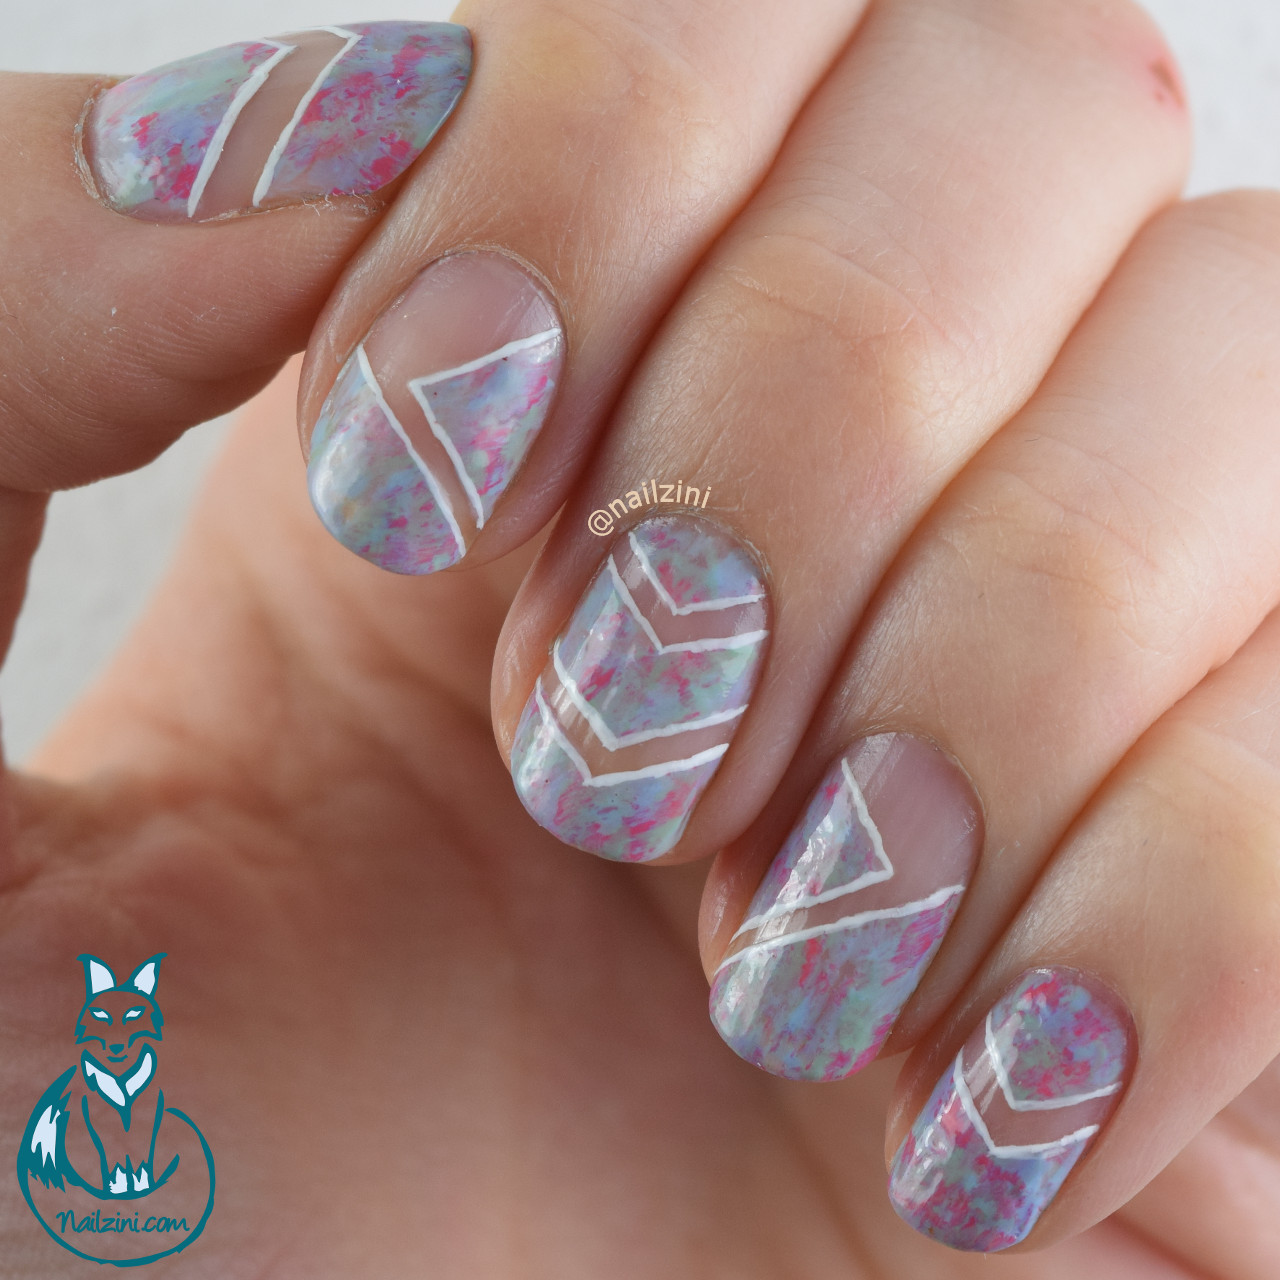 Negative Space Nail Art | Nailzini: A Nail Art Blog